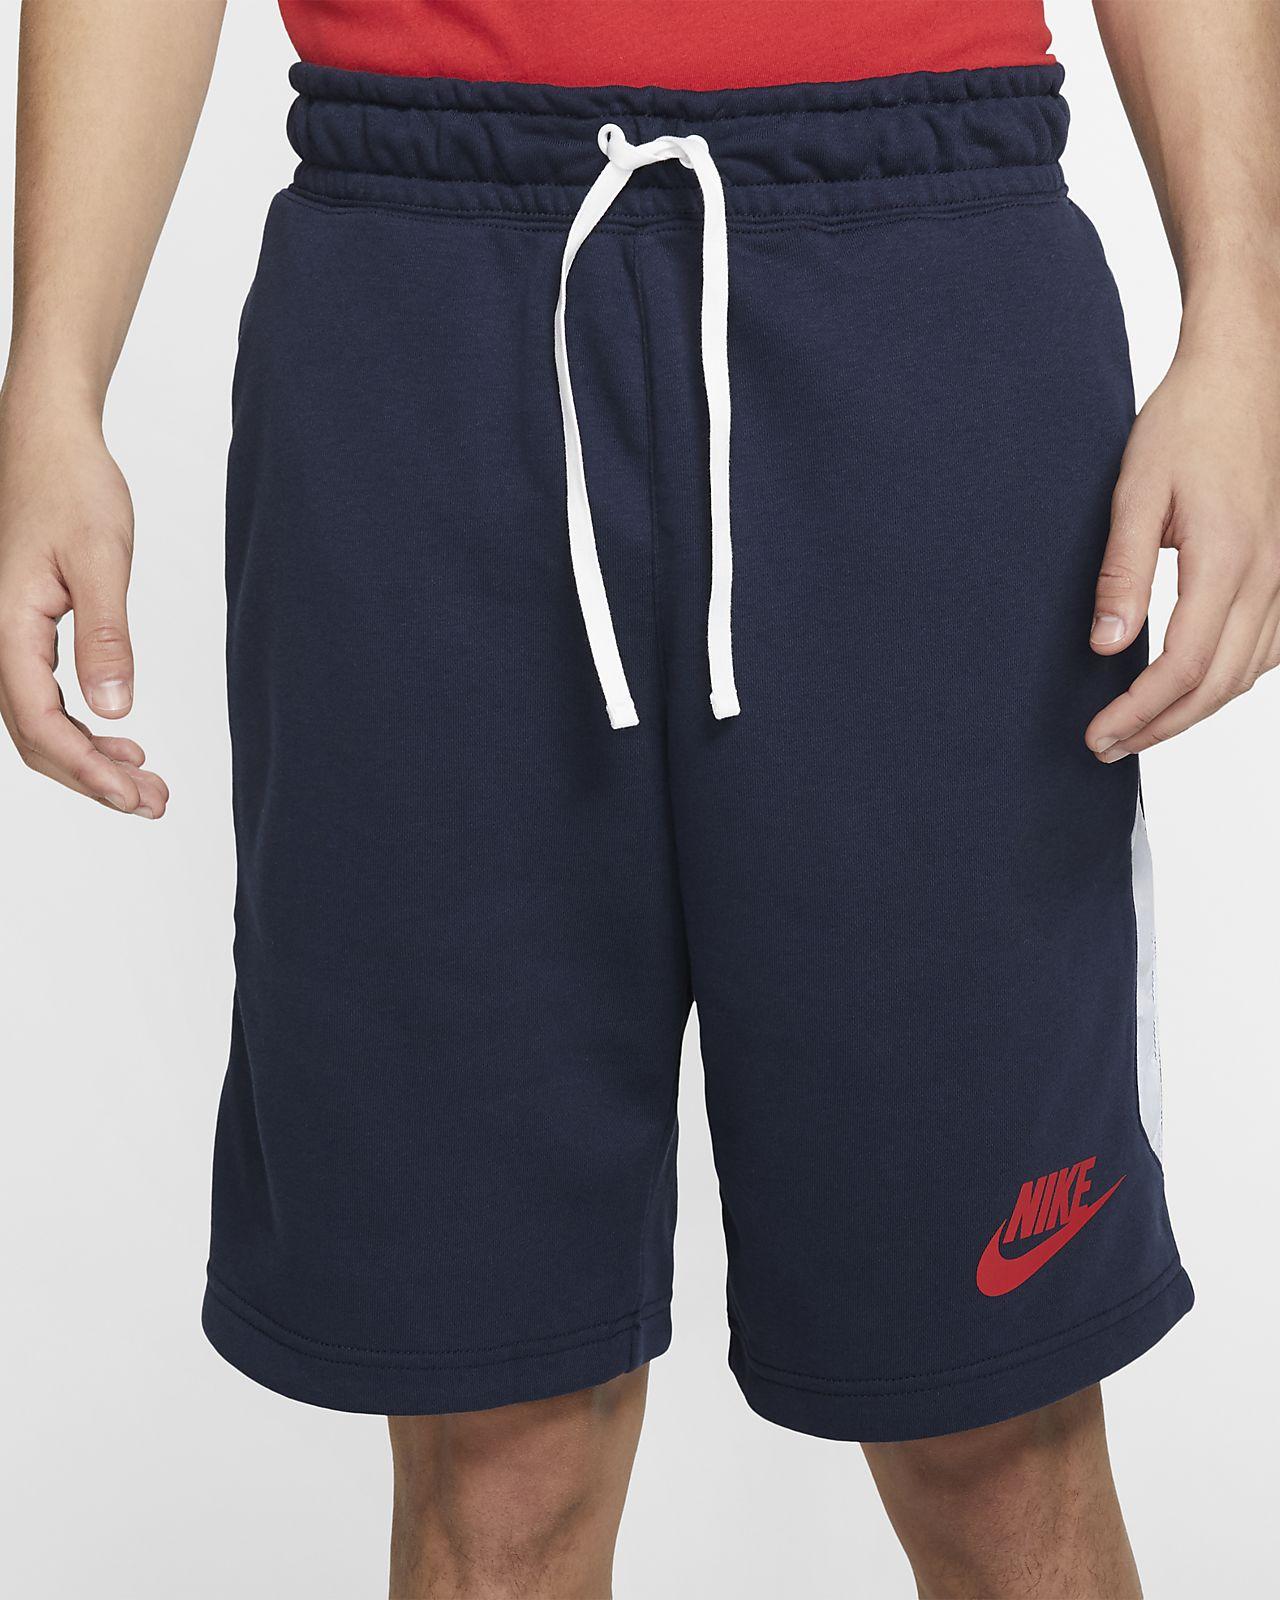 Nike Sportswear Erkek Şortu